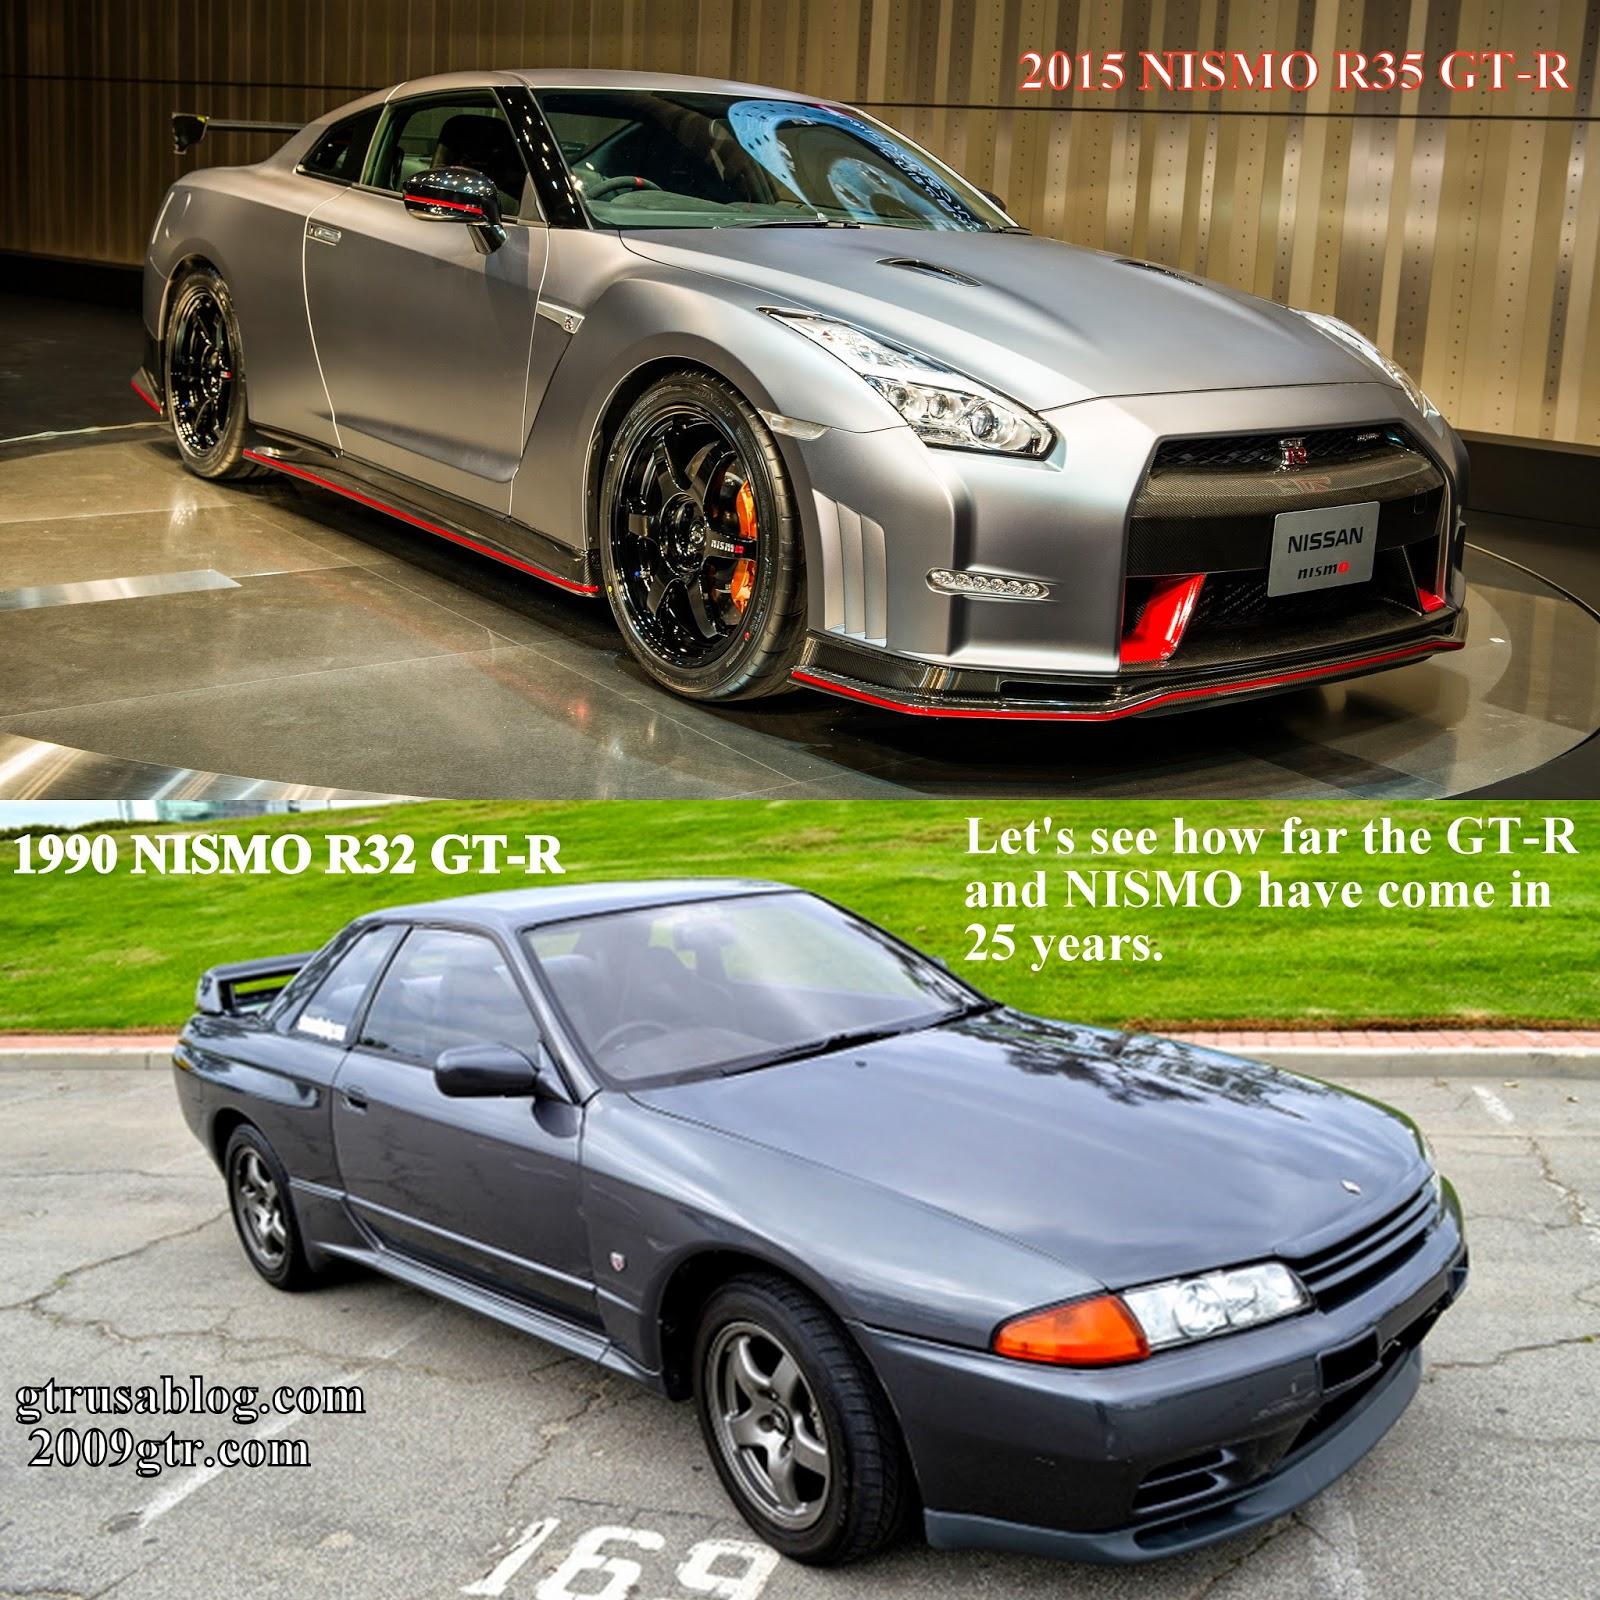 2015 NISMO R35 GT R vs 1990 NISMO R32 GT R 2009gtr